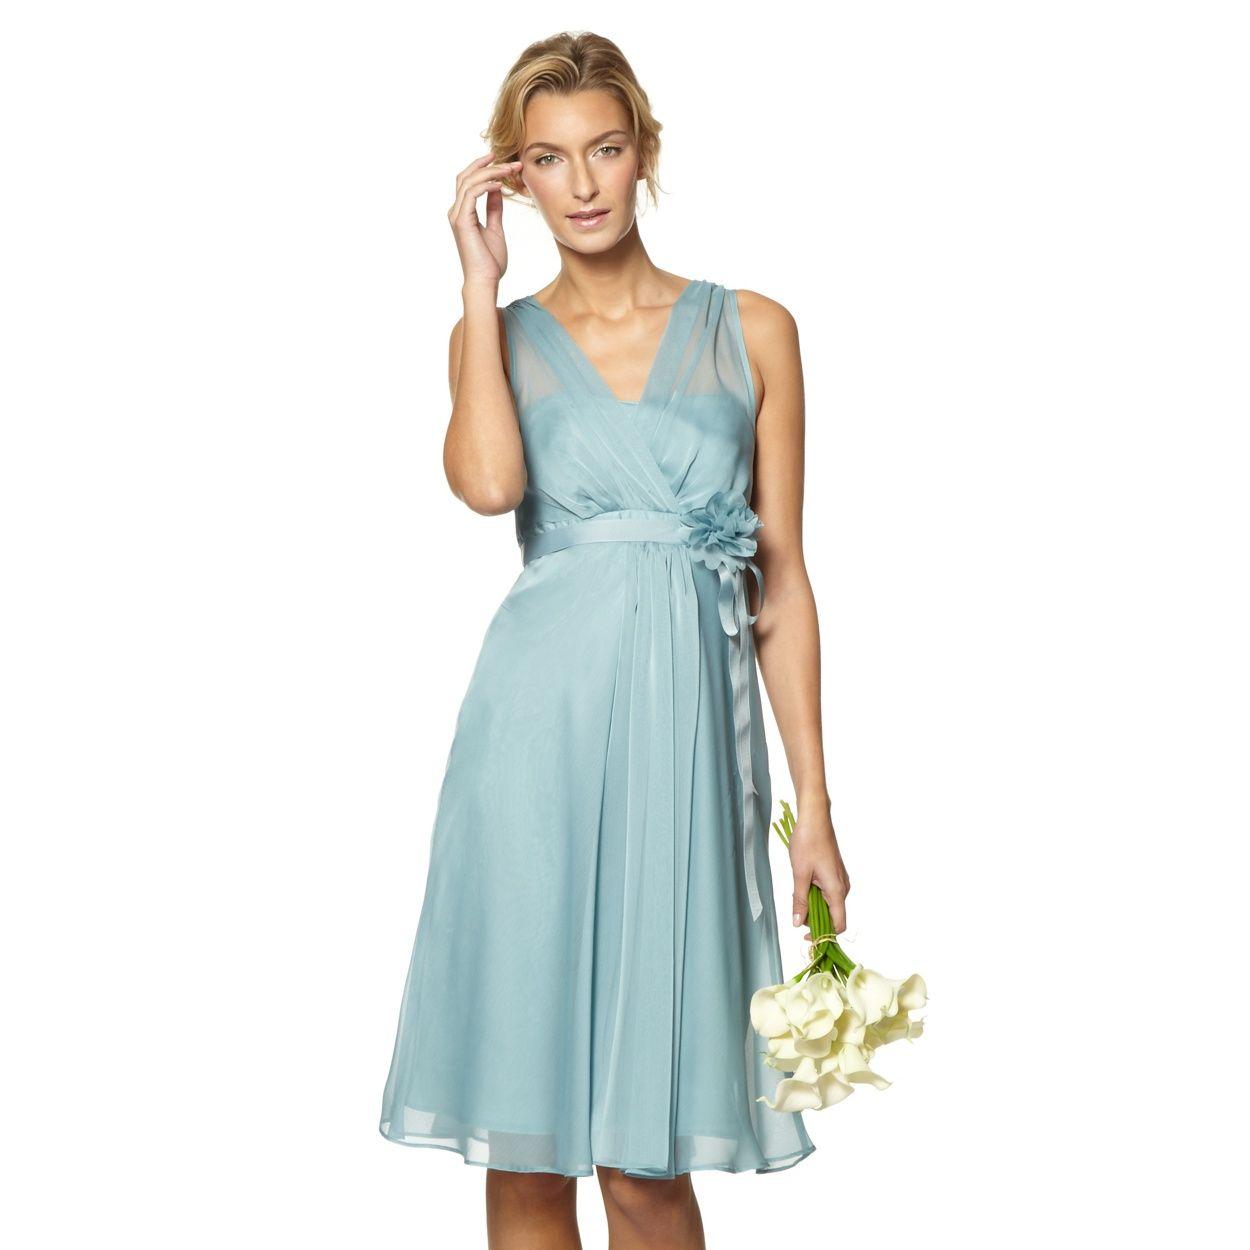 DEBUT Pale green chiffon waterfall dress- at Debenhams.com | For the ...